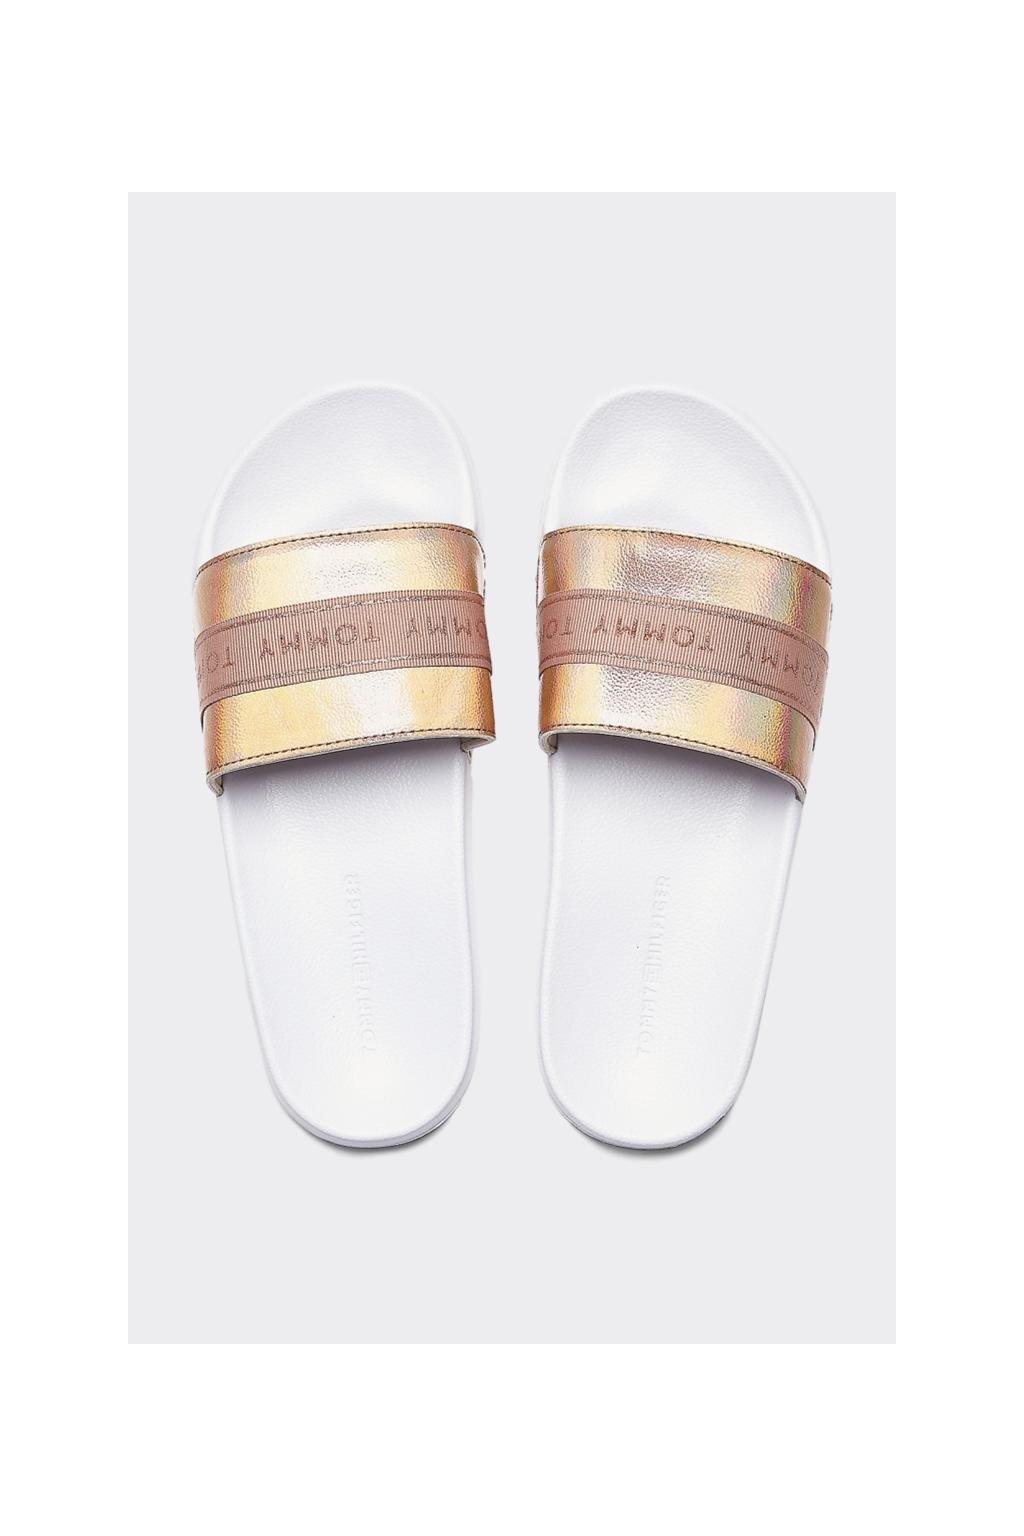 Tommy Hilfiger pantofle dámské - rose gold